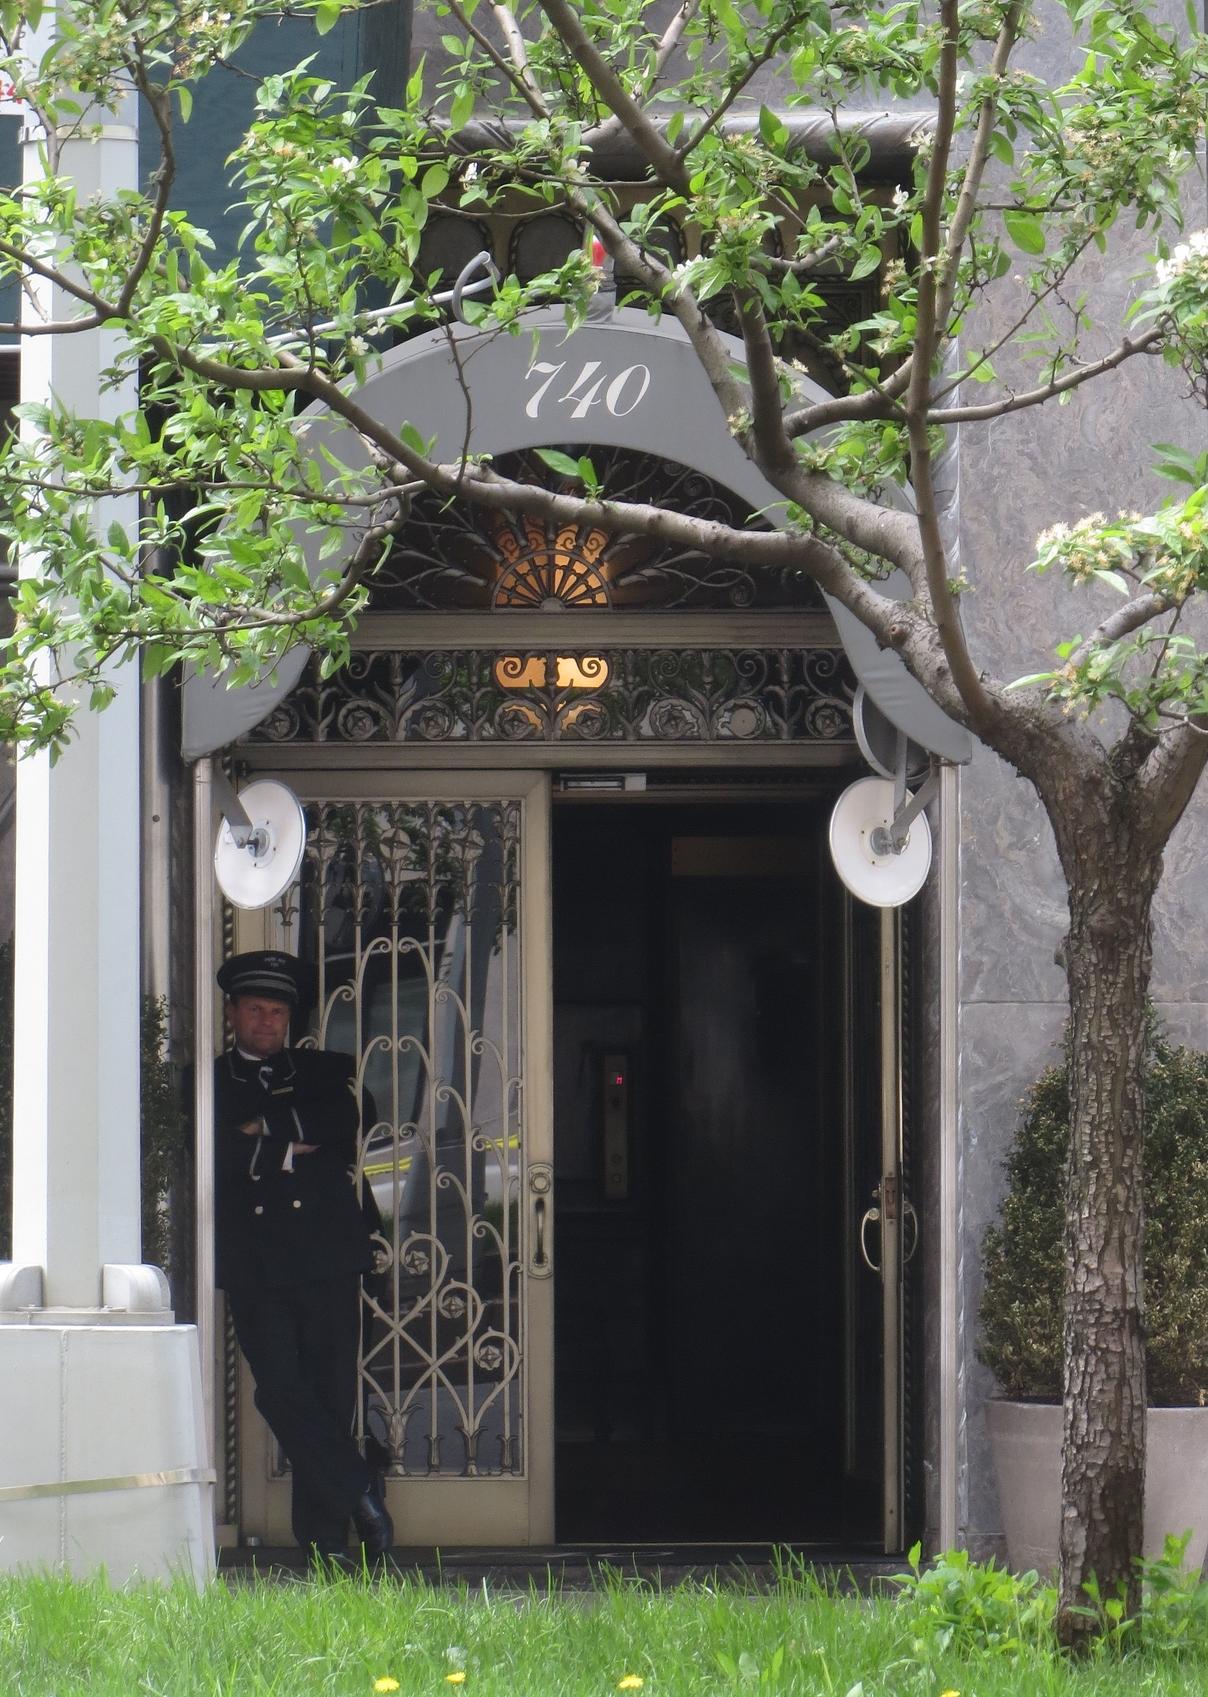 740 Park Avenue Doorman